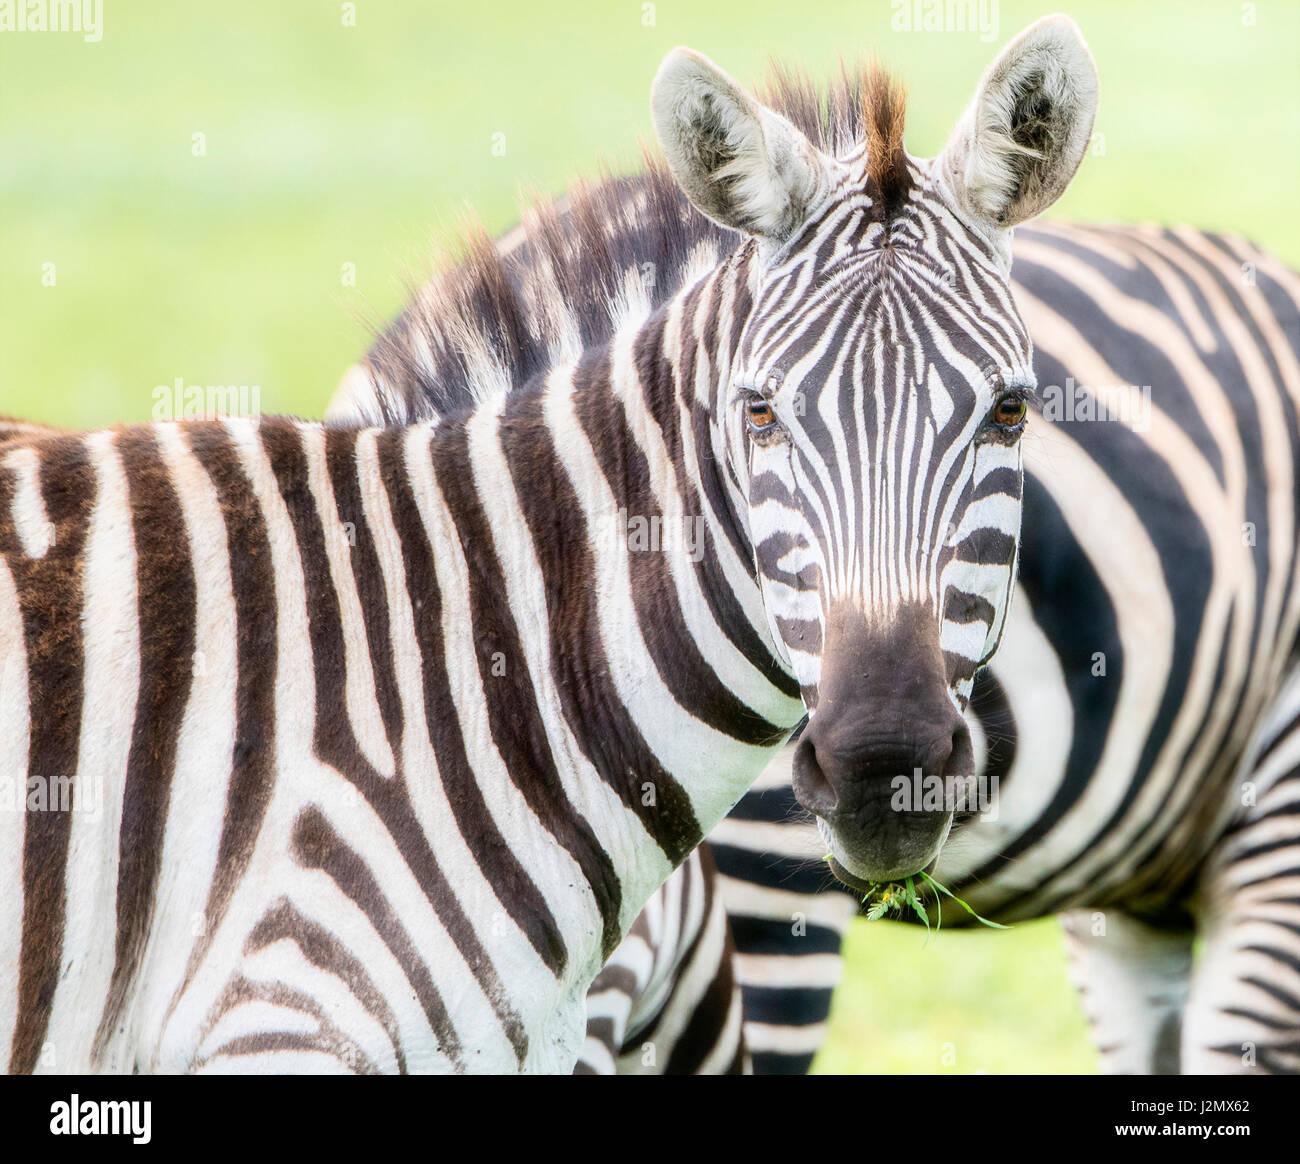 Wild Burchell's Zebra on the Serengeti in Tanzania - Stock Image